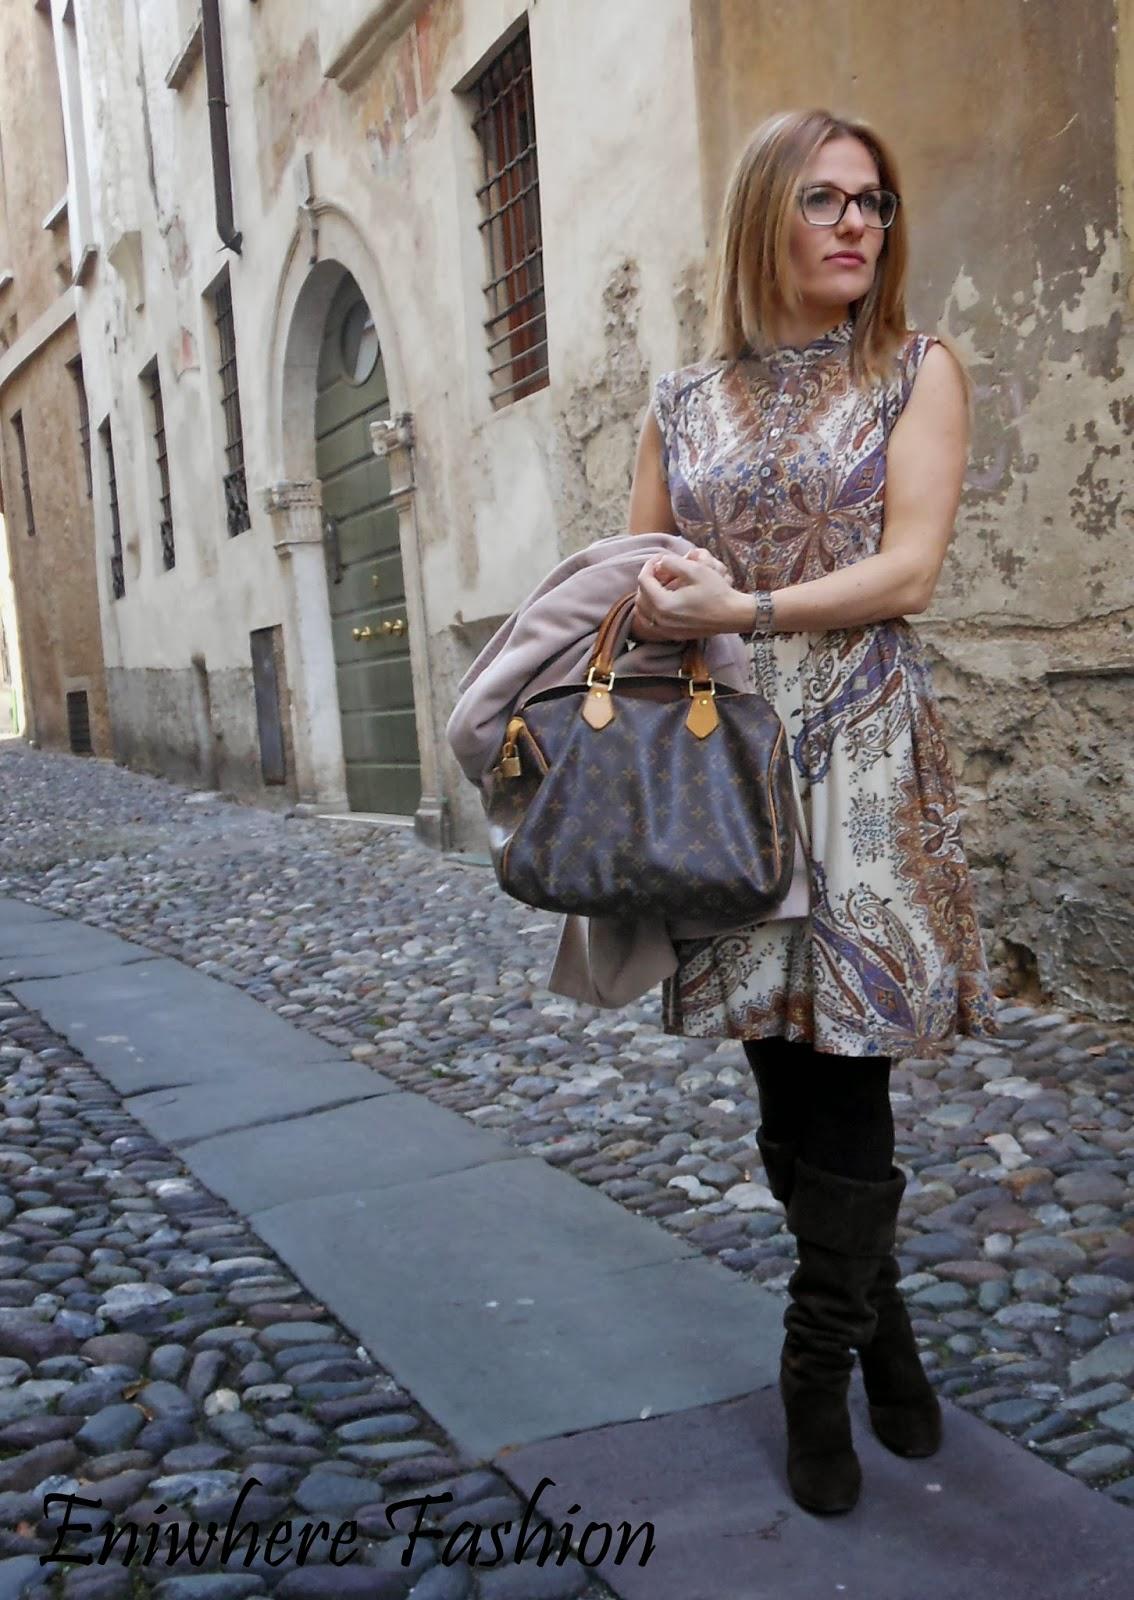 Eniwhere Fashion cappotto cammello floral print dress speedy LV